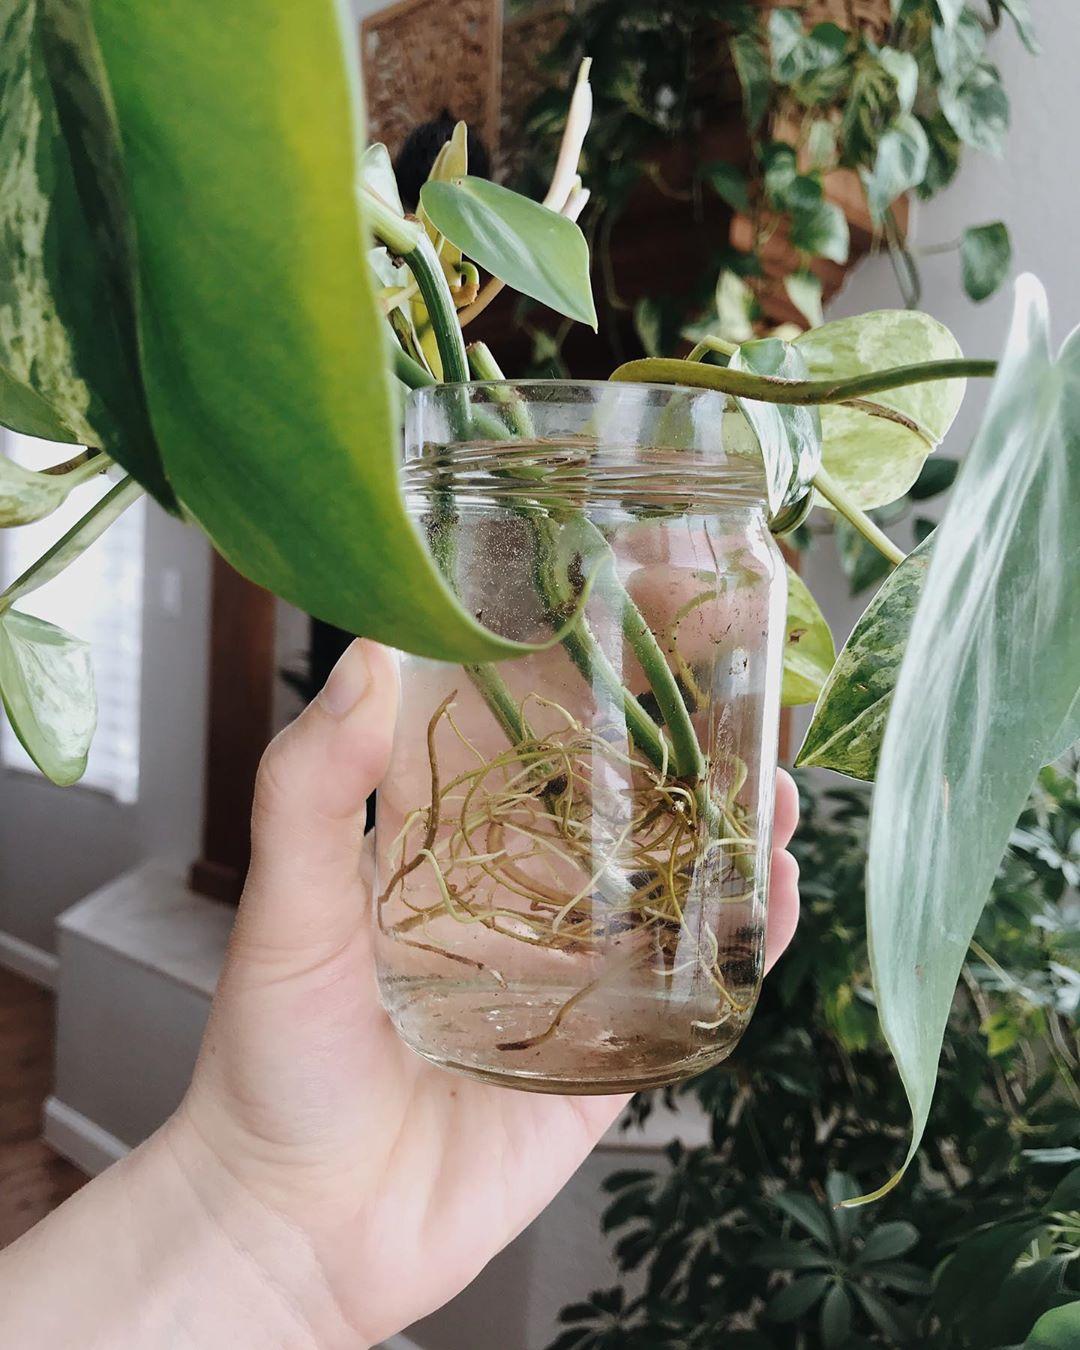 A Little Root Appreciation 🌱 My Pathos - Gardening